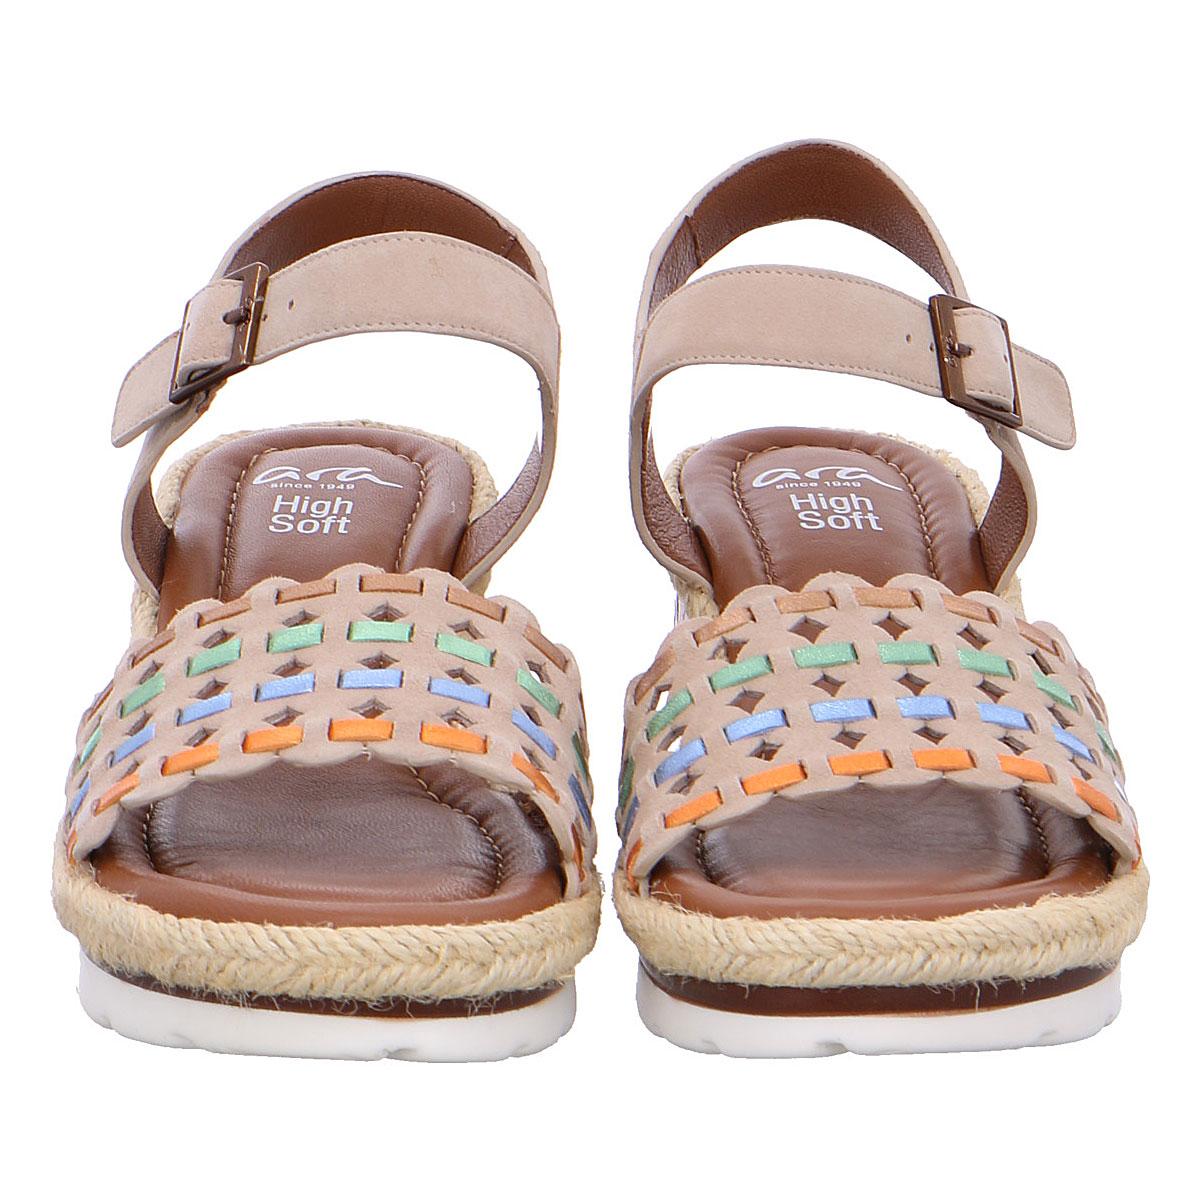 Дамски сандали на платформа Ара / ara 12-28404-06 кафяви - снимка 5